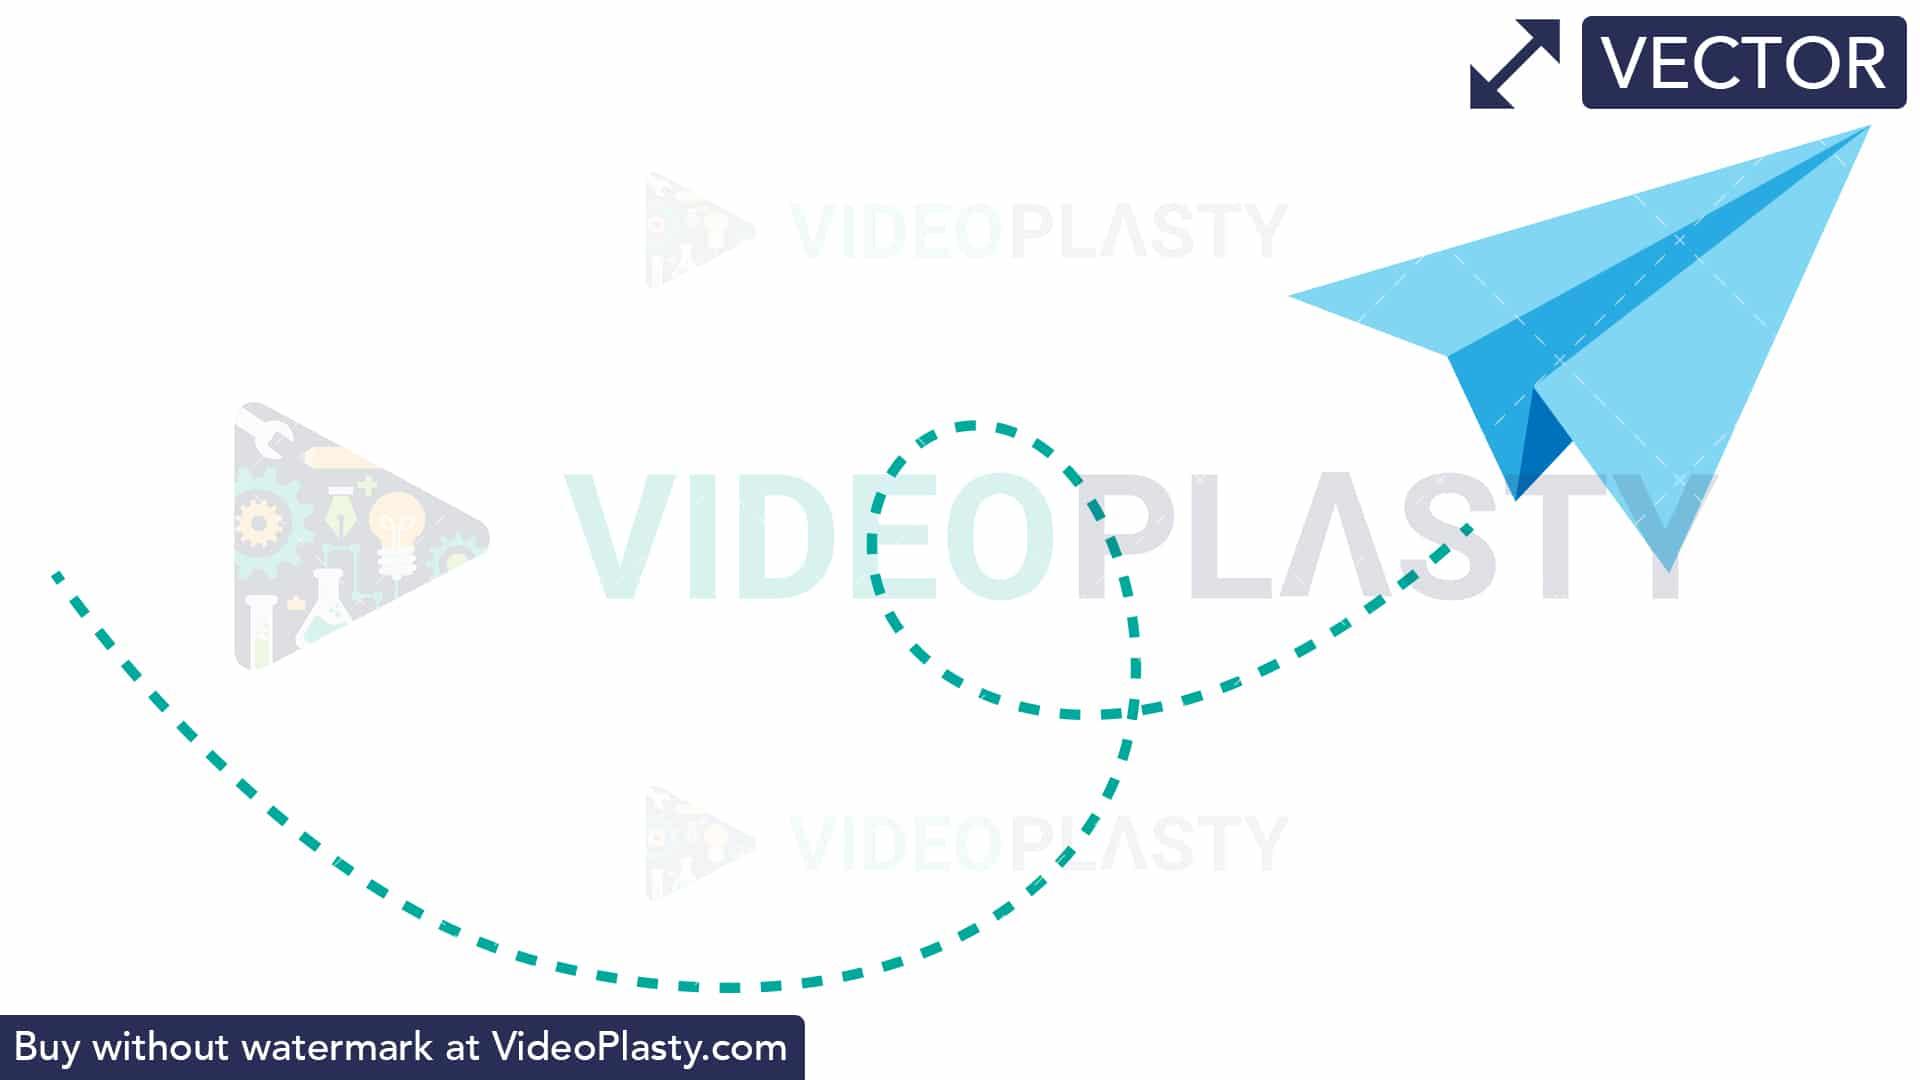 Vector paper clipart jpg transparent download Paper Plane [VECTOR] jpg transparent download